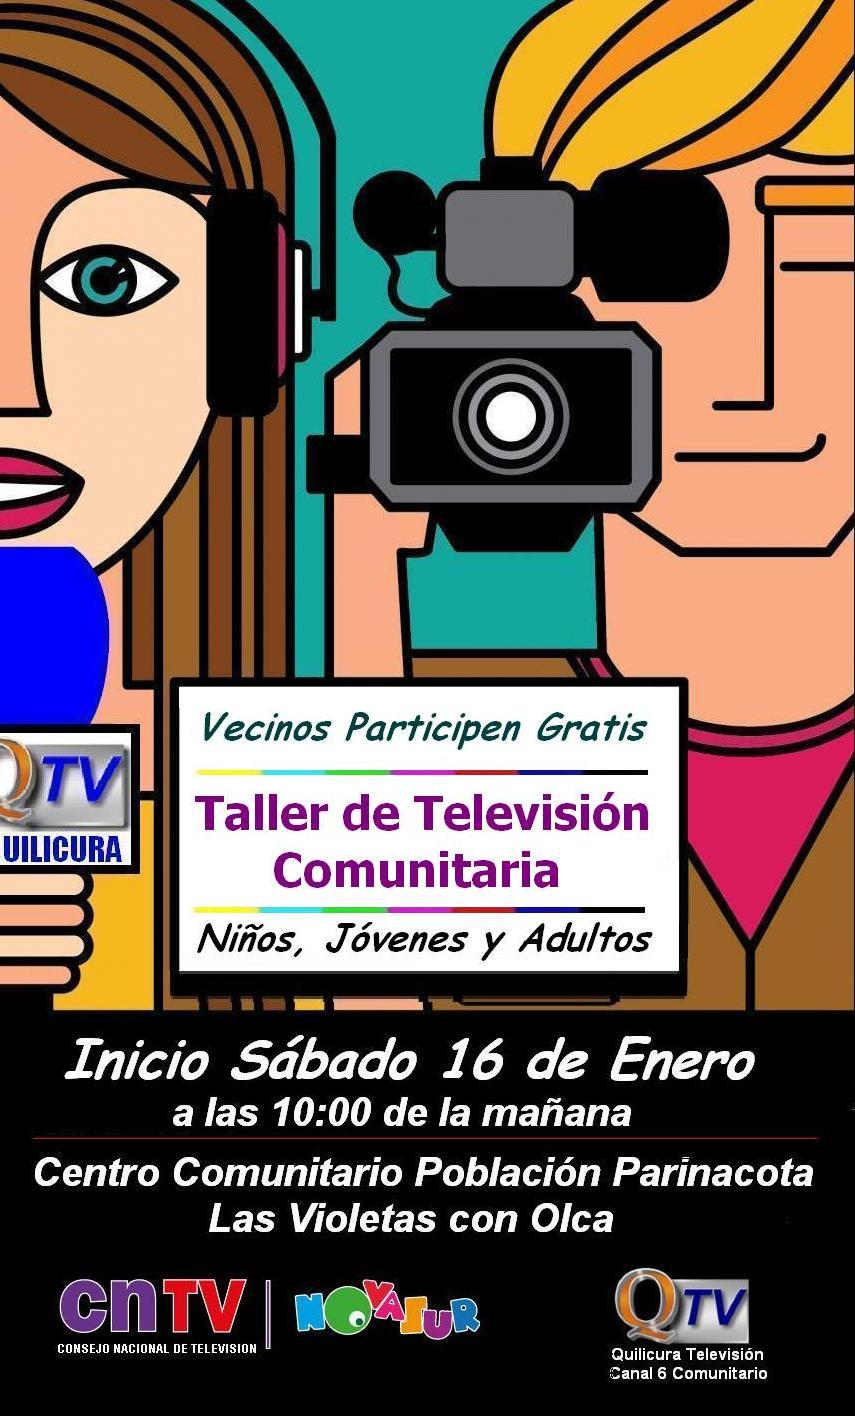 TALLERES DE VERANO Comunicación Audiovisual y  Periodismo Comunitario(Gratis)